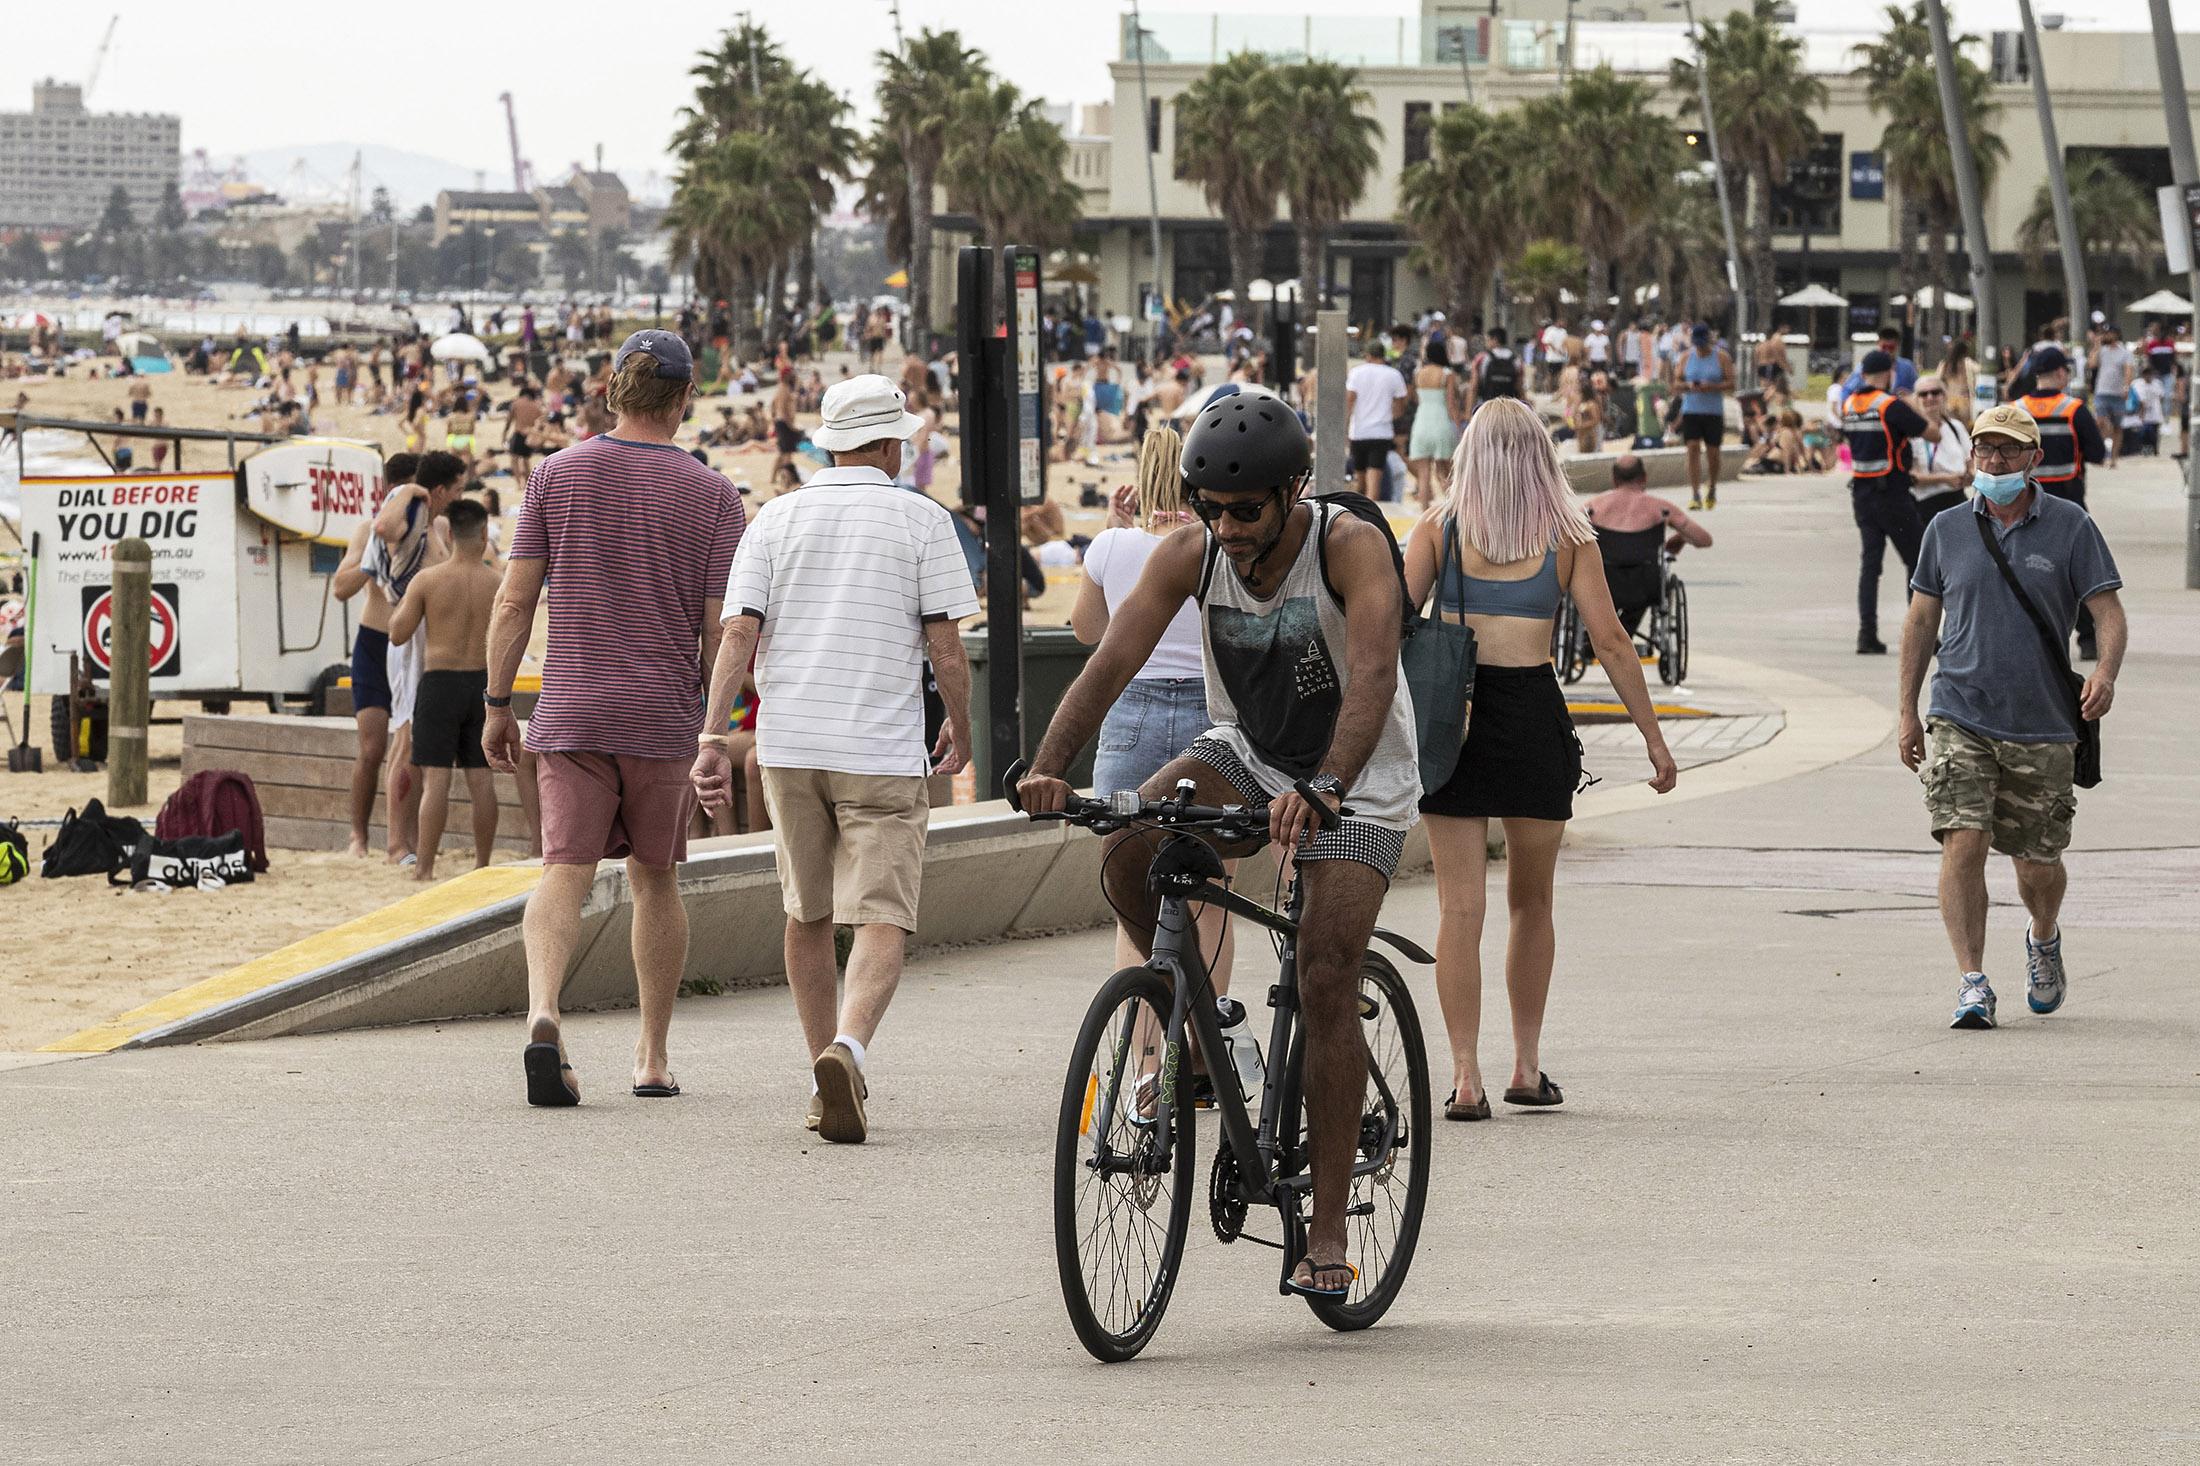 People enjoy the weather at St. Kilda beach on Nov. 27, in Melbourne, Australia.